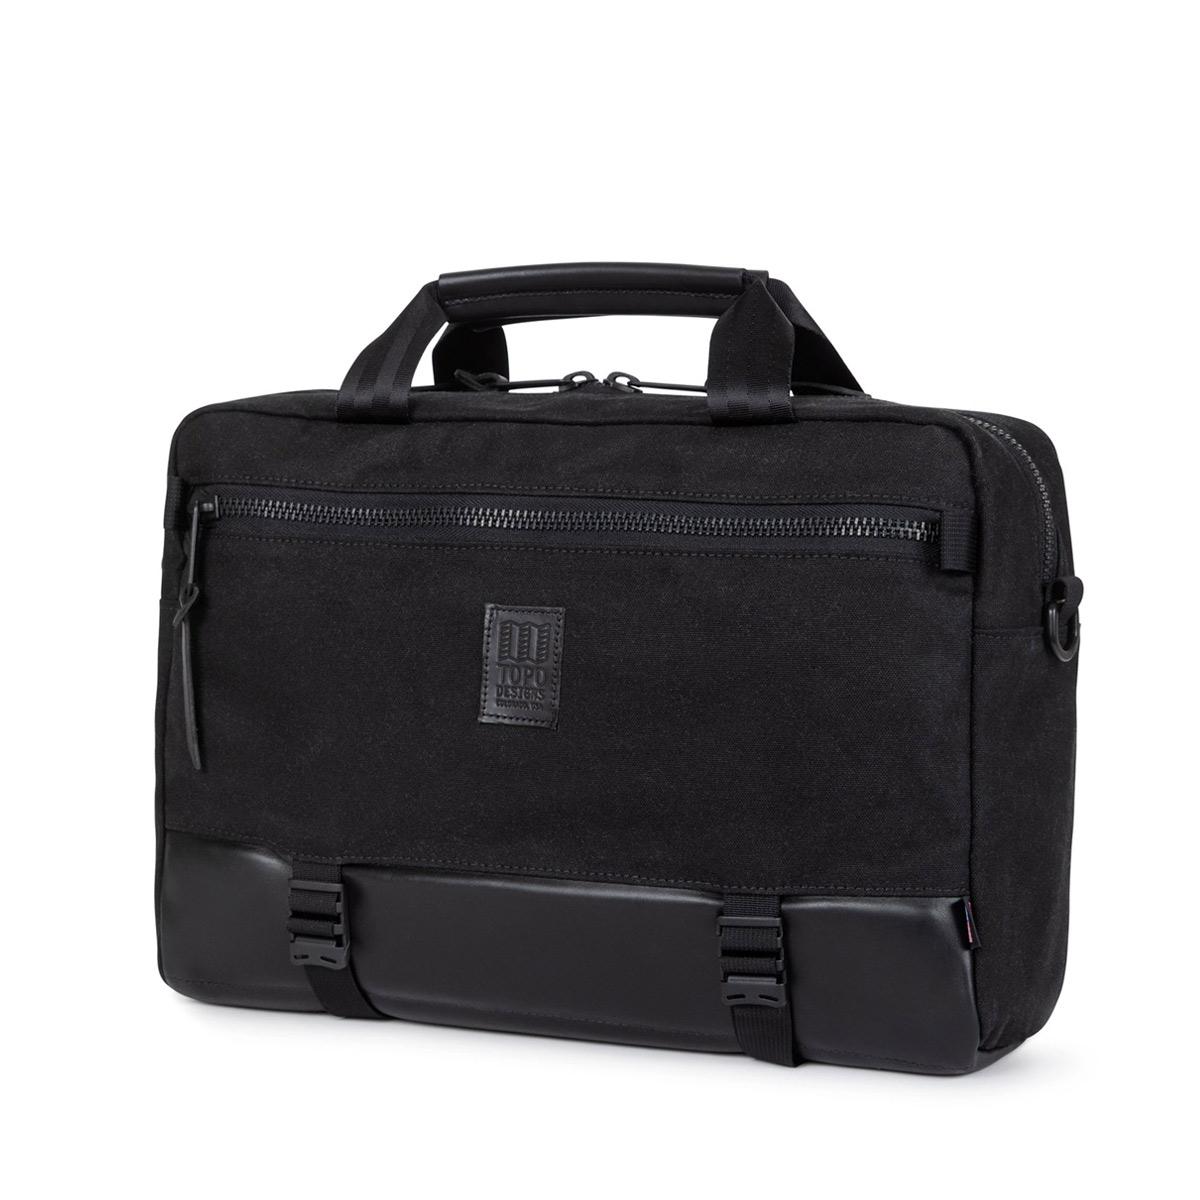 Topo Designs Commuter Briefcase Heritige Black Canvas/Black Leather